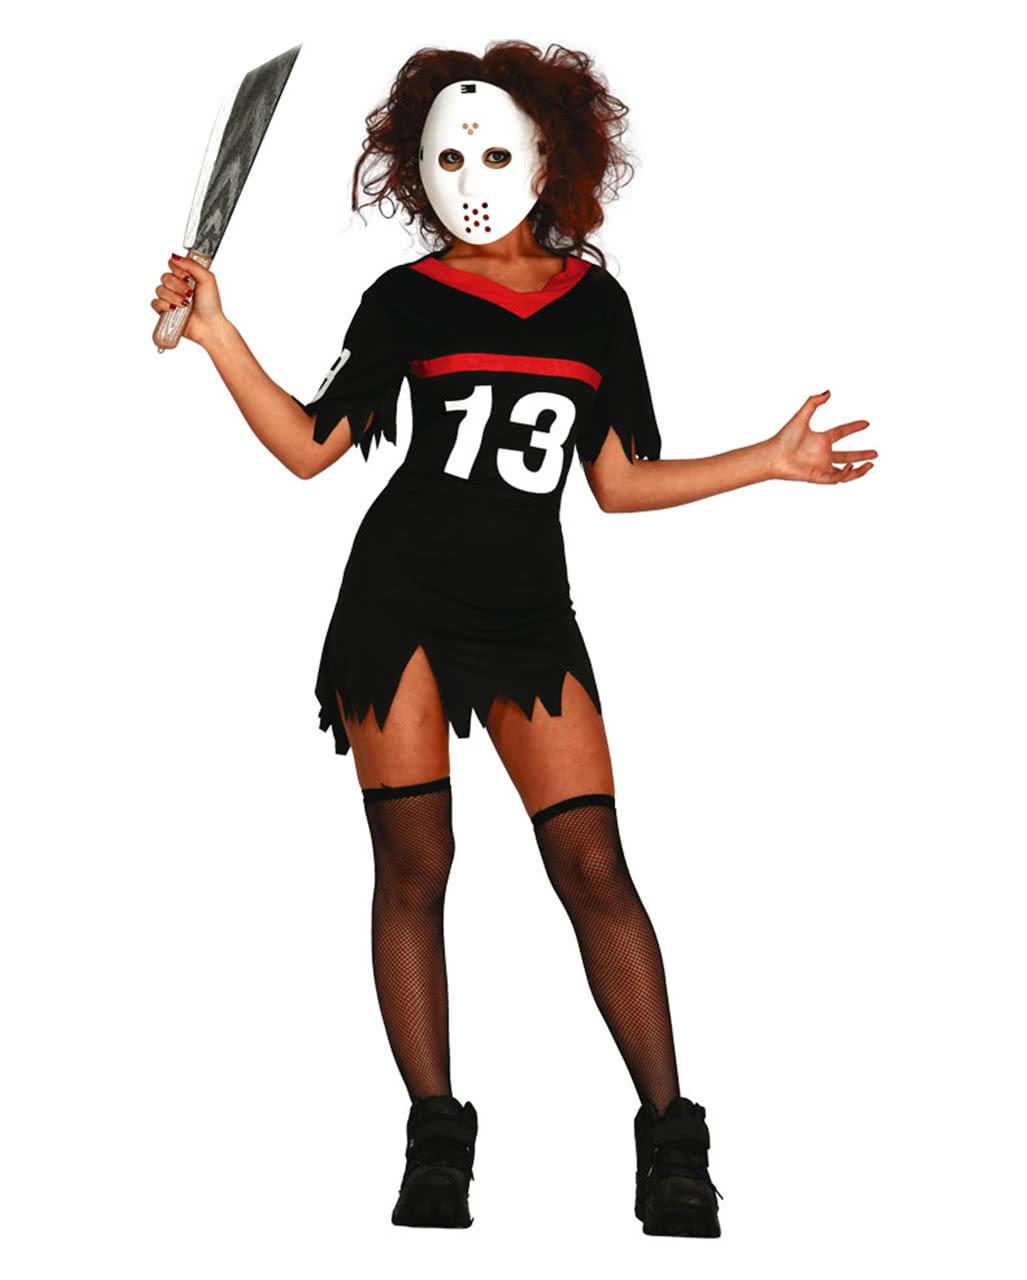 eishockey damenkost m mit maske horror kost me f r halloween horror. Black Bedroom Furniture Sets. Home Design Ideas